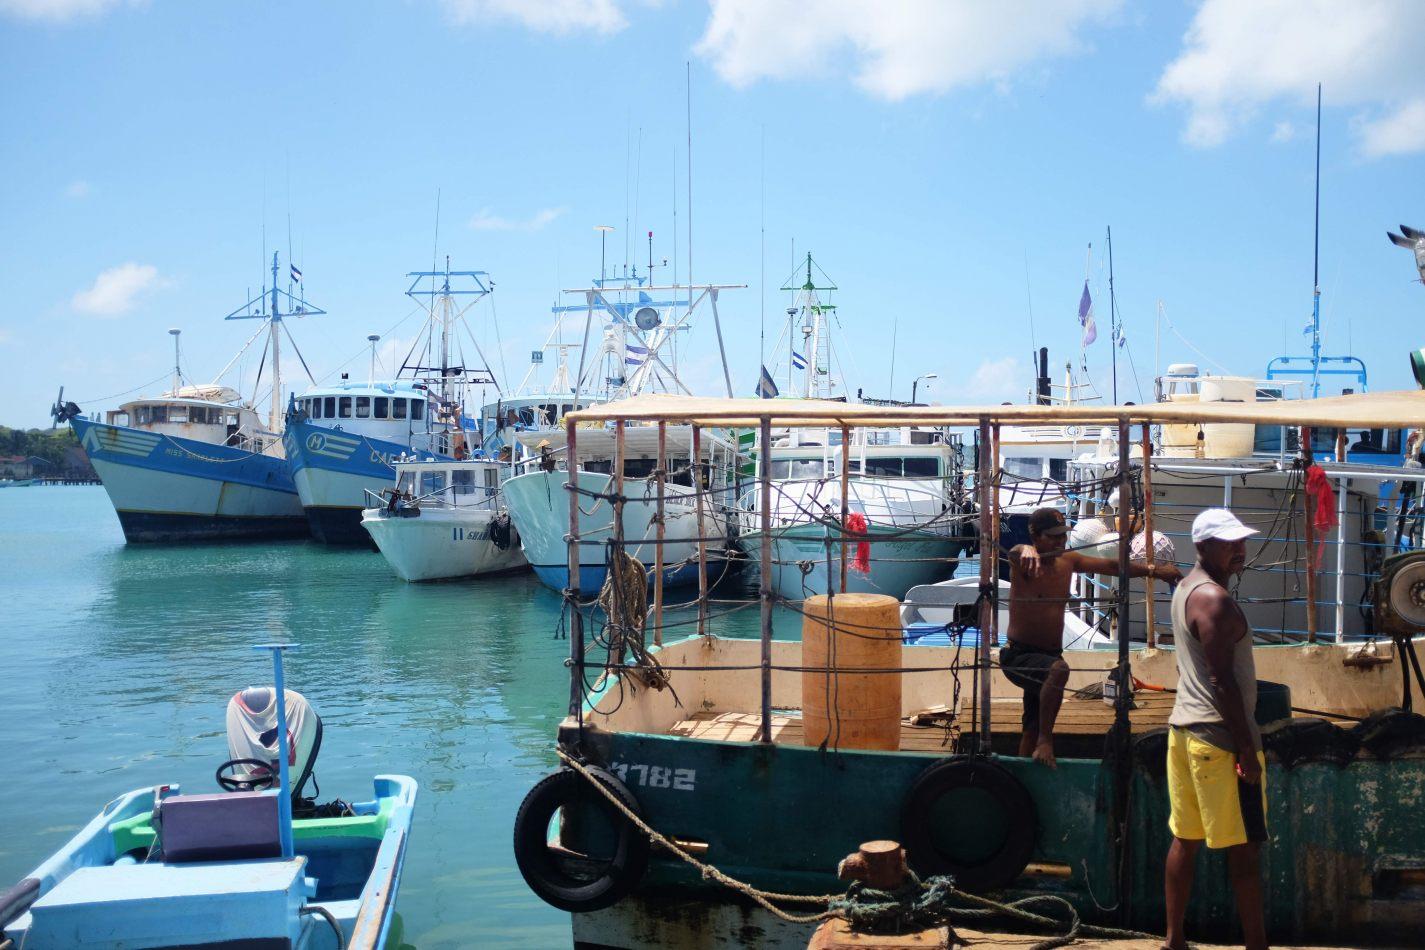 Hibiscus & Nomada : Corn Islands - Ferry Dock Big Corn